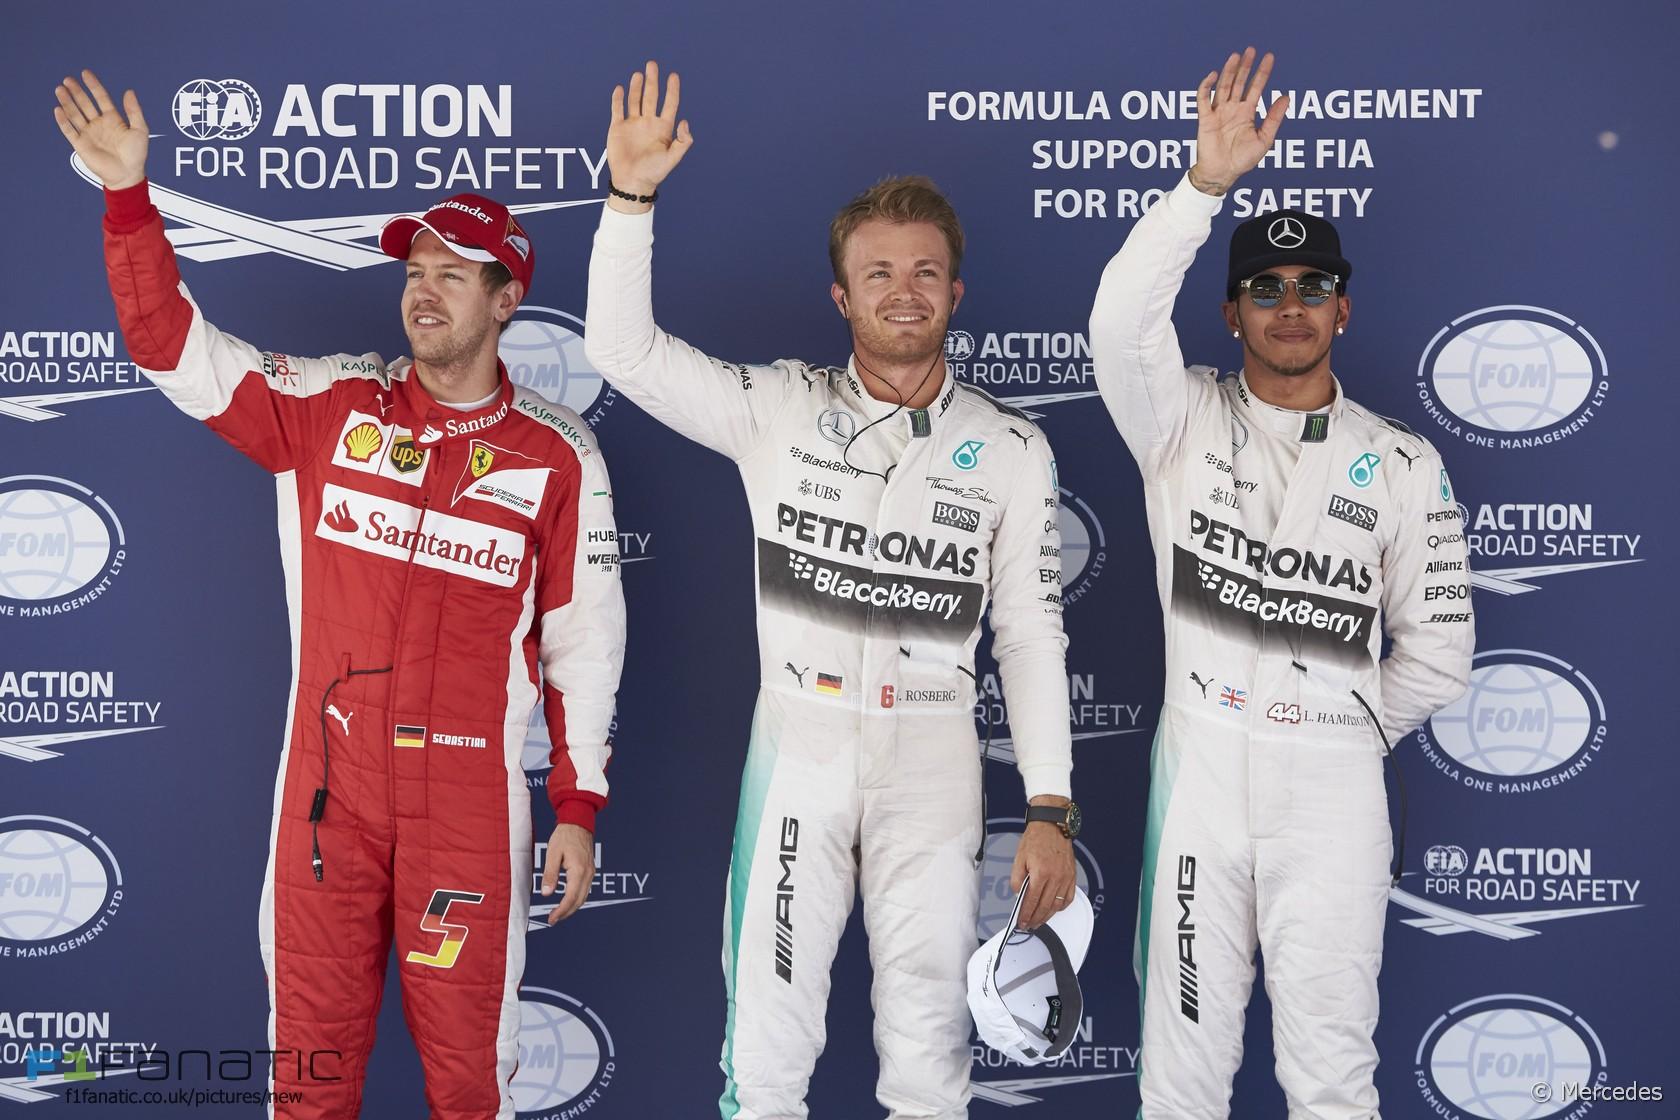 Sebastian Vettel, Nico Rosberg, Lewis Hamilton, Circuit de Catalunya, 2015